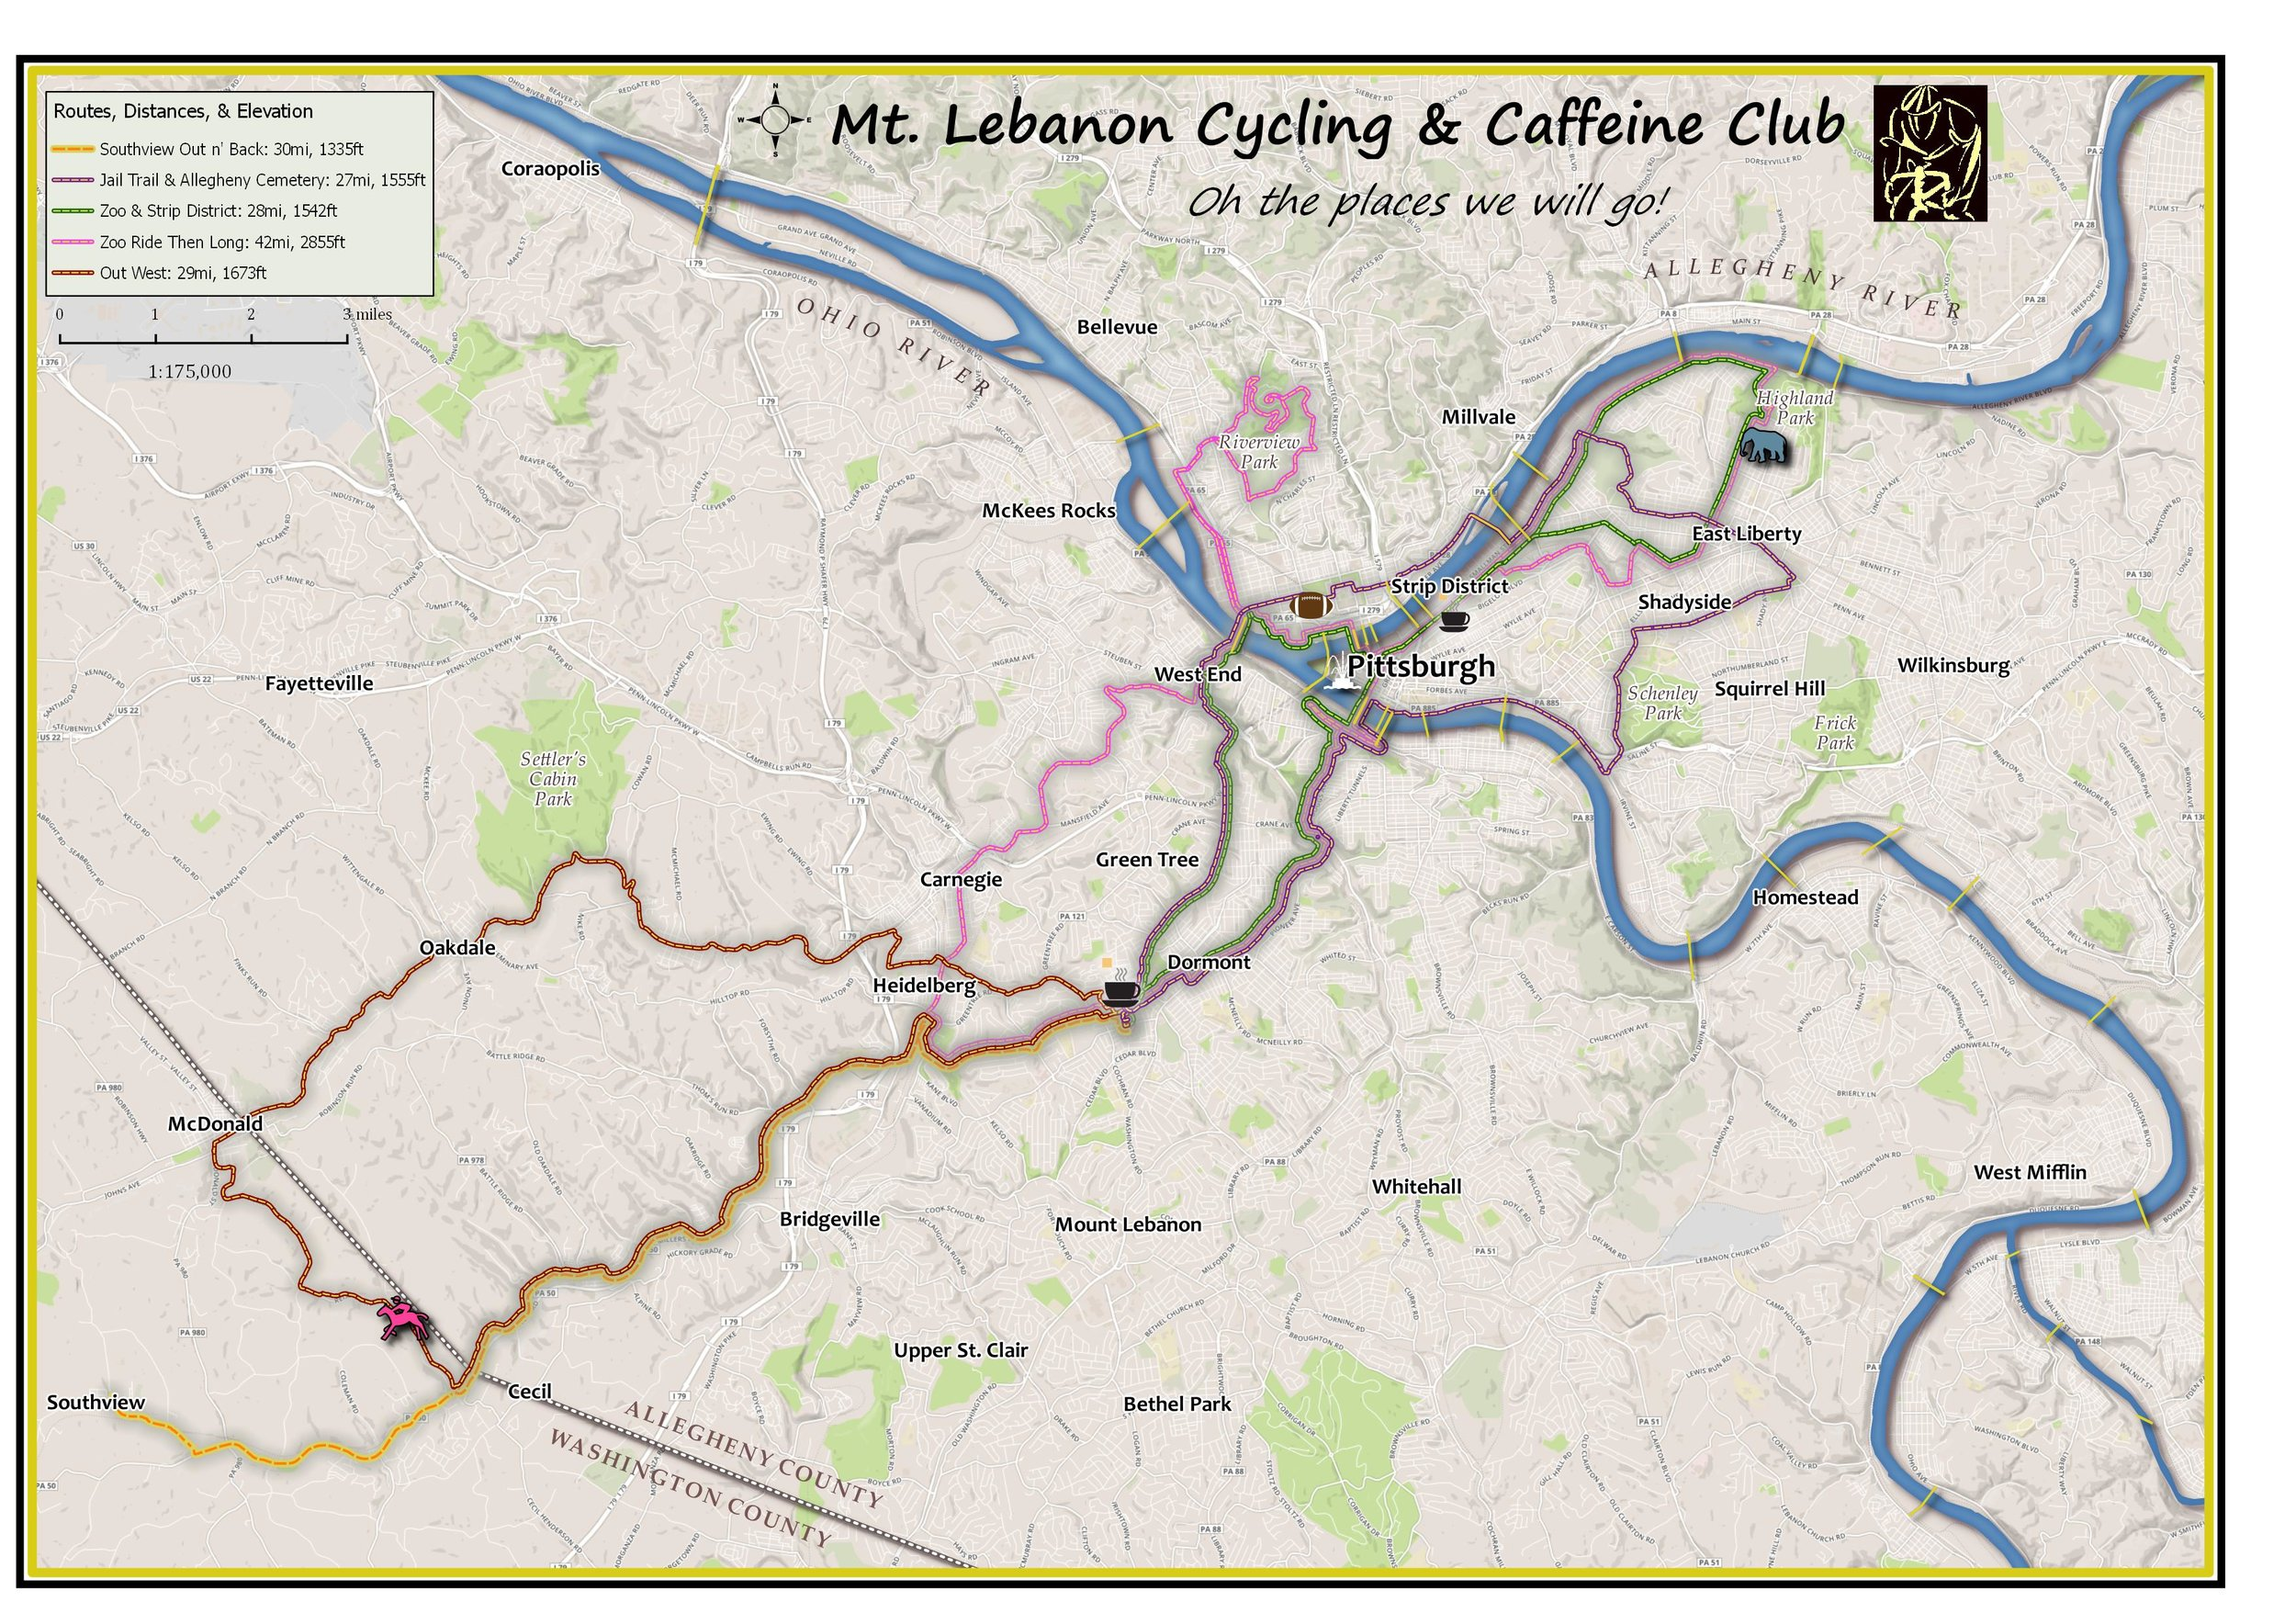 2016 - Data sources:MapBox, Open Street Map, ESRI